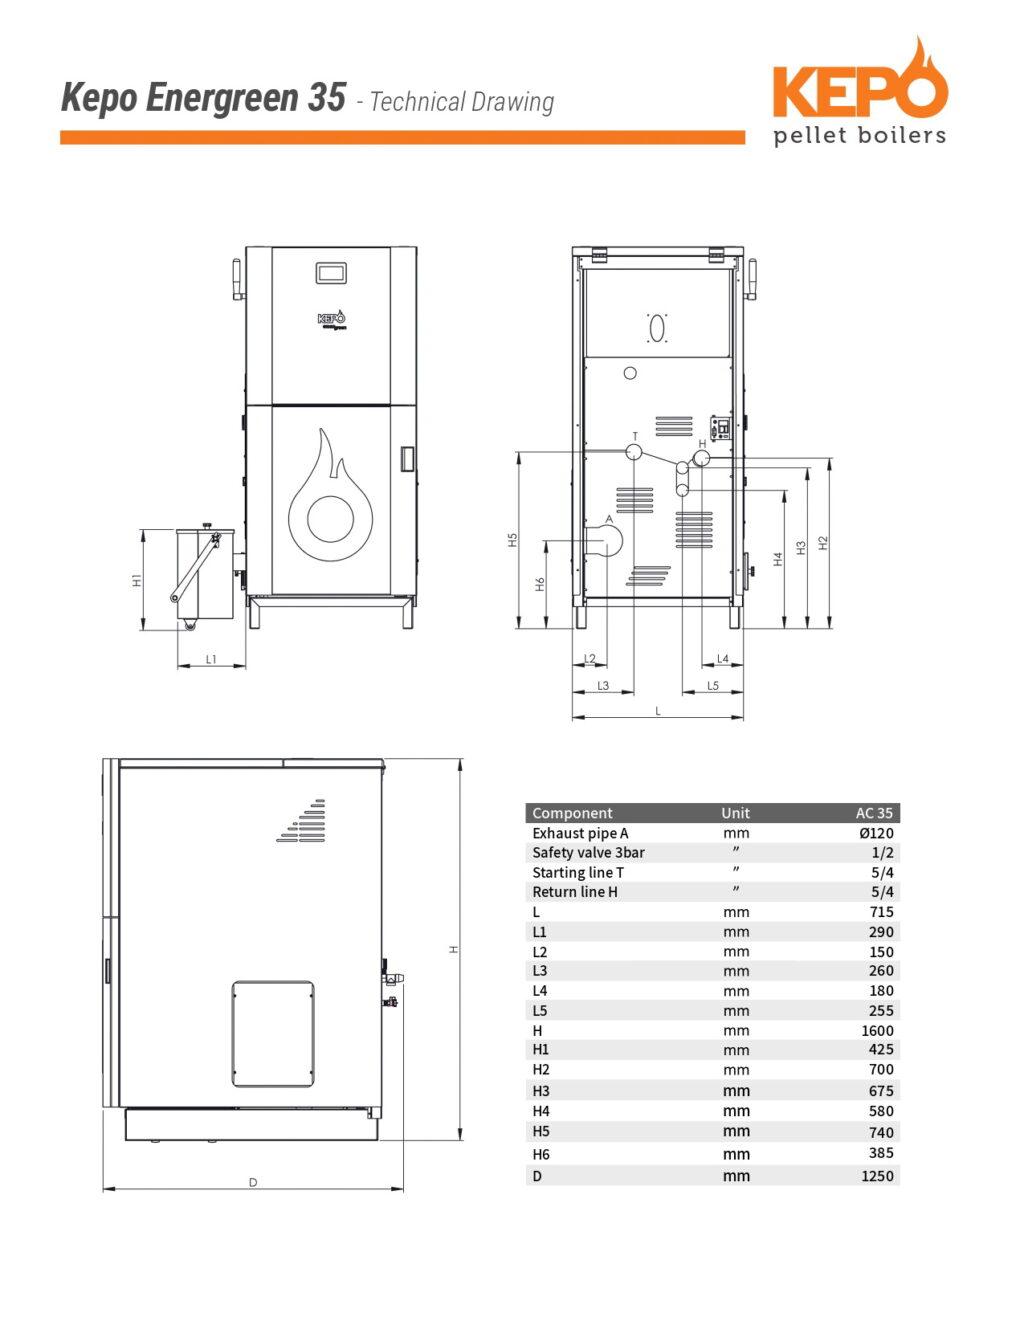 Kepo Energreen35 Techical Drawing